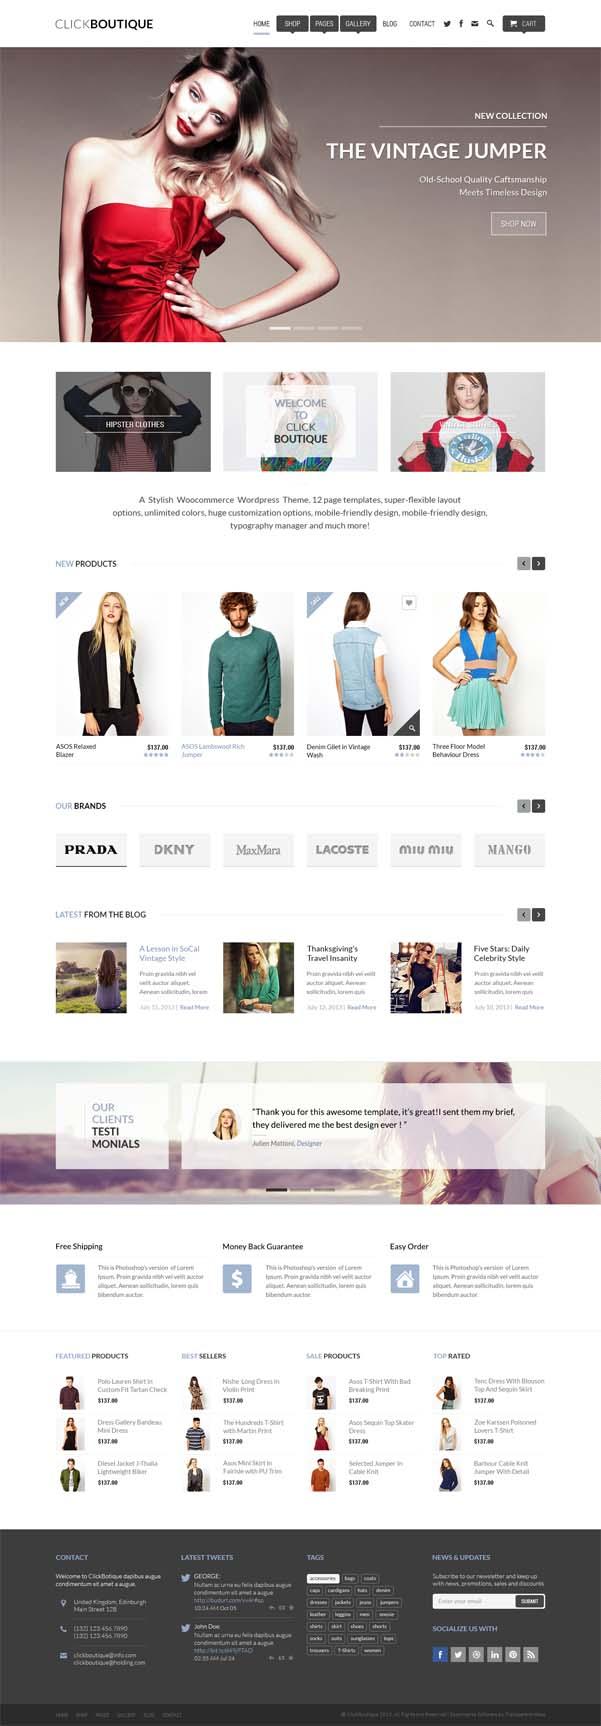 Click Boutique - WordPress WooCommerce Theme